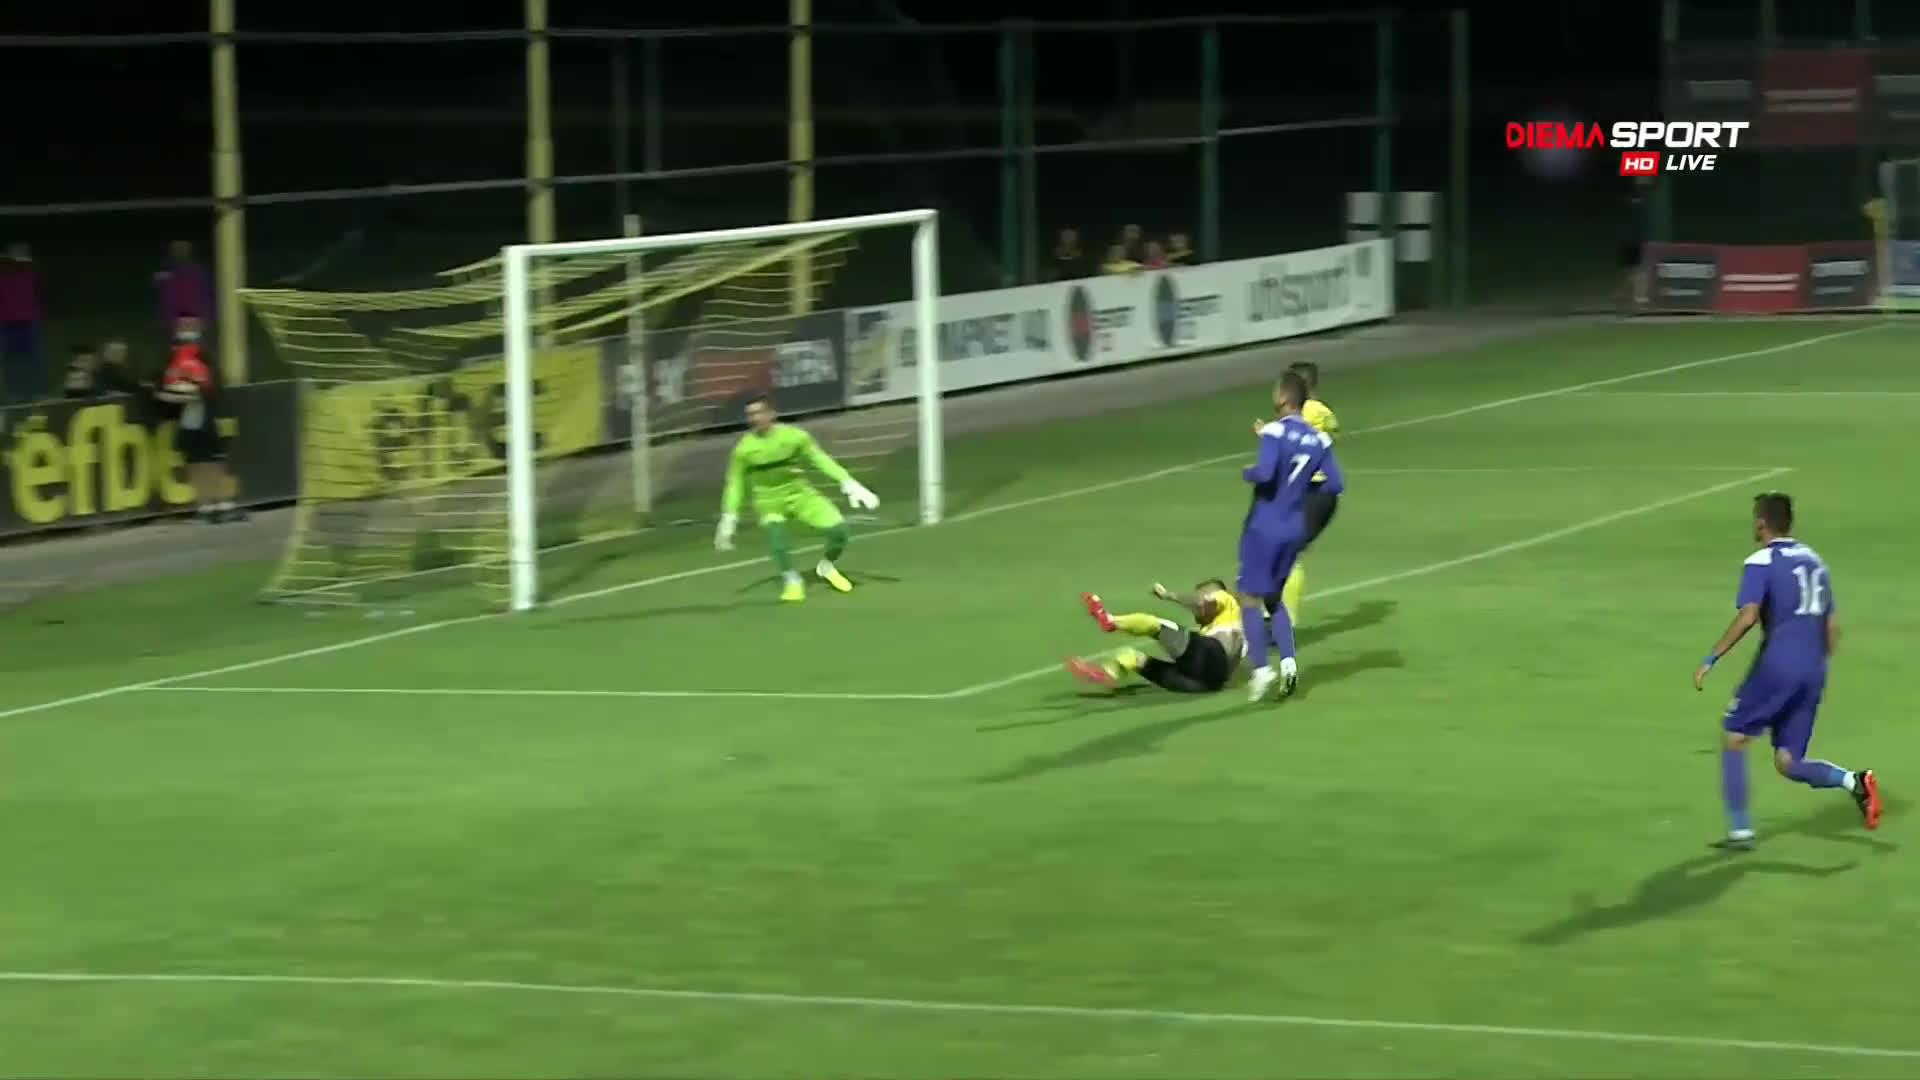 Ботев Пловдив - Етър 1:0 /репортаж/